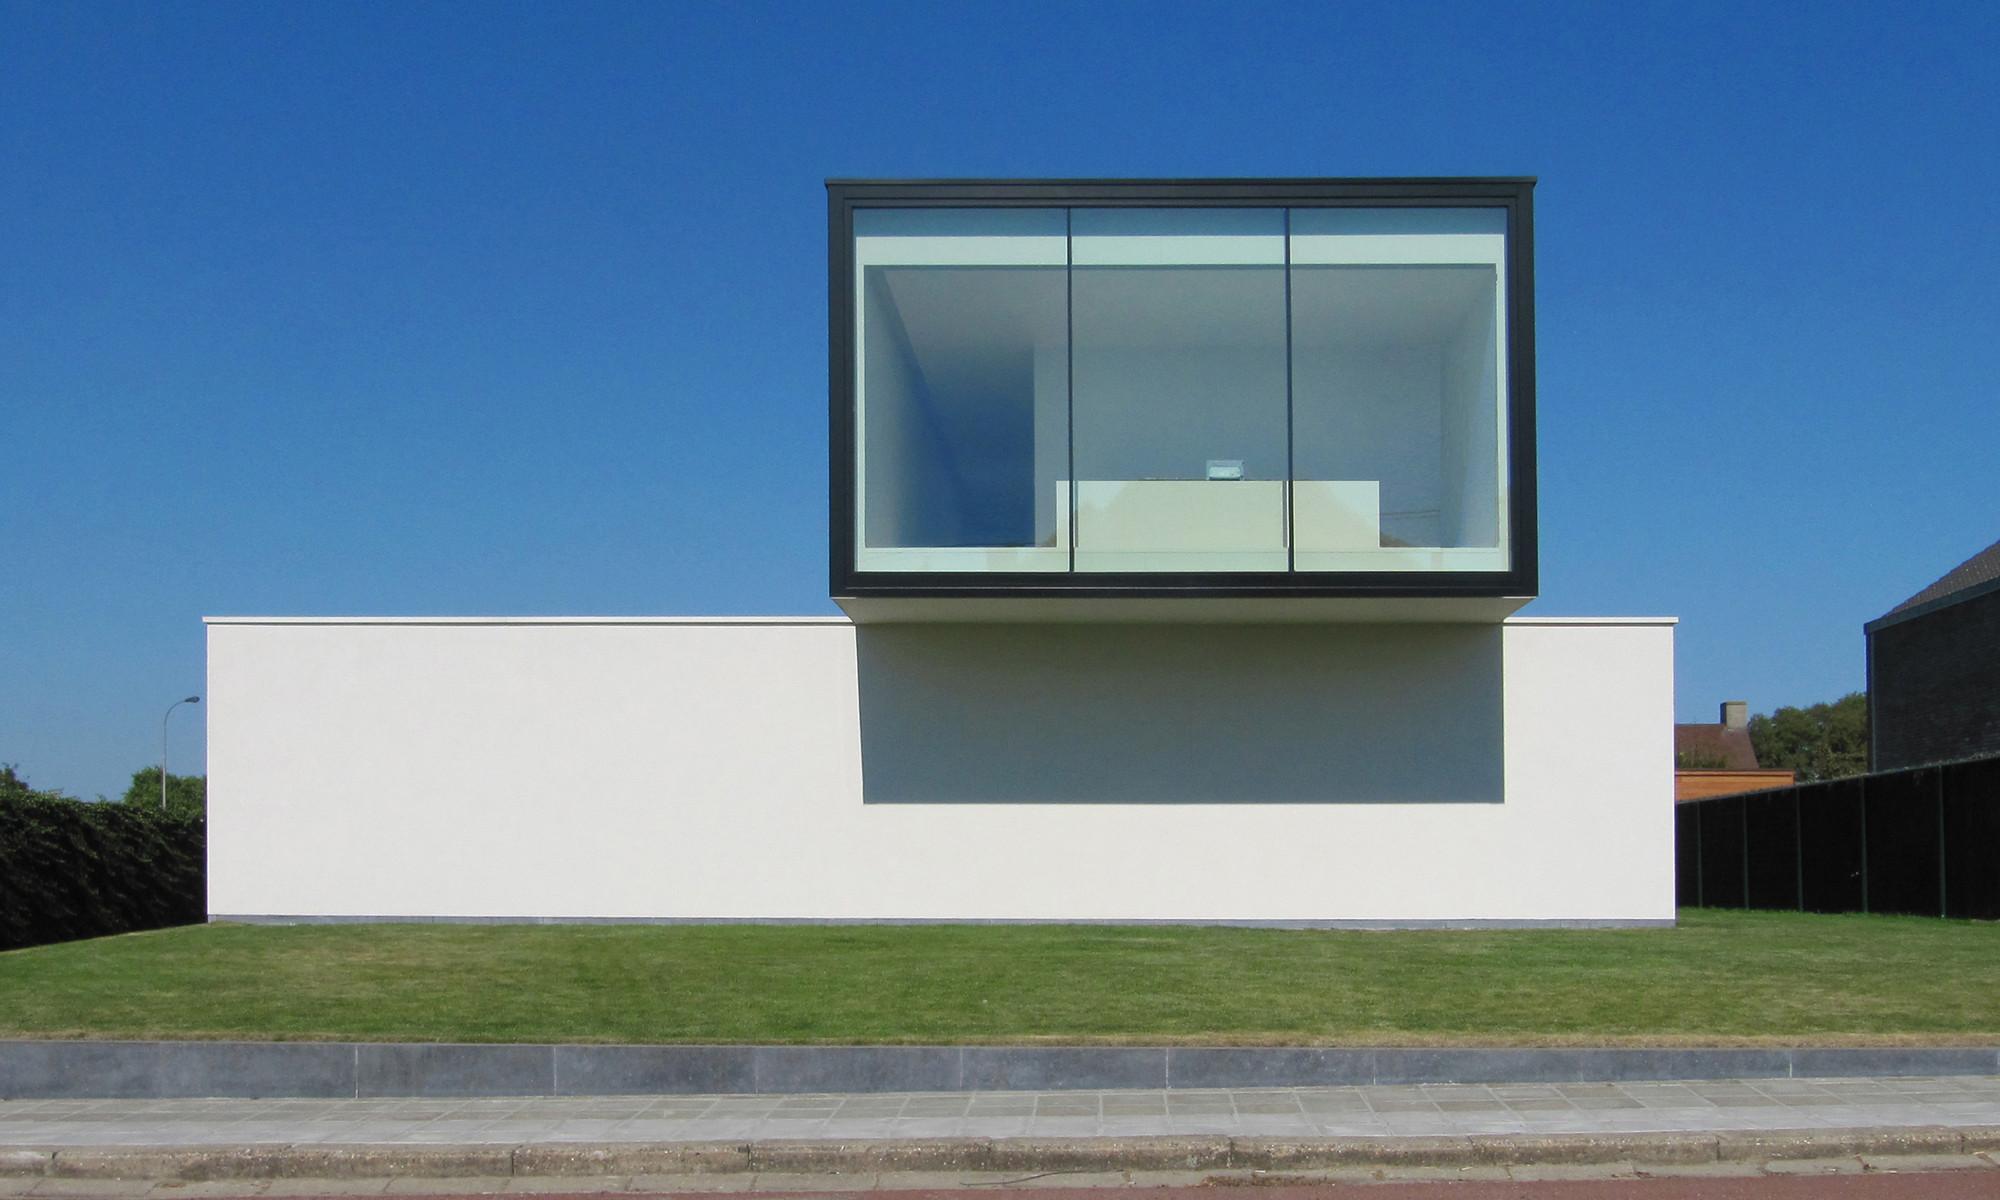 Casa VRT – Tielt / DE JAEGHERE Architectuuratelier, Cortesía de Steven De Jaeghere